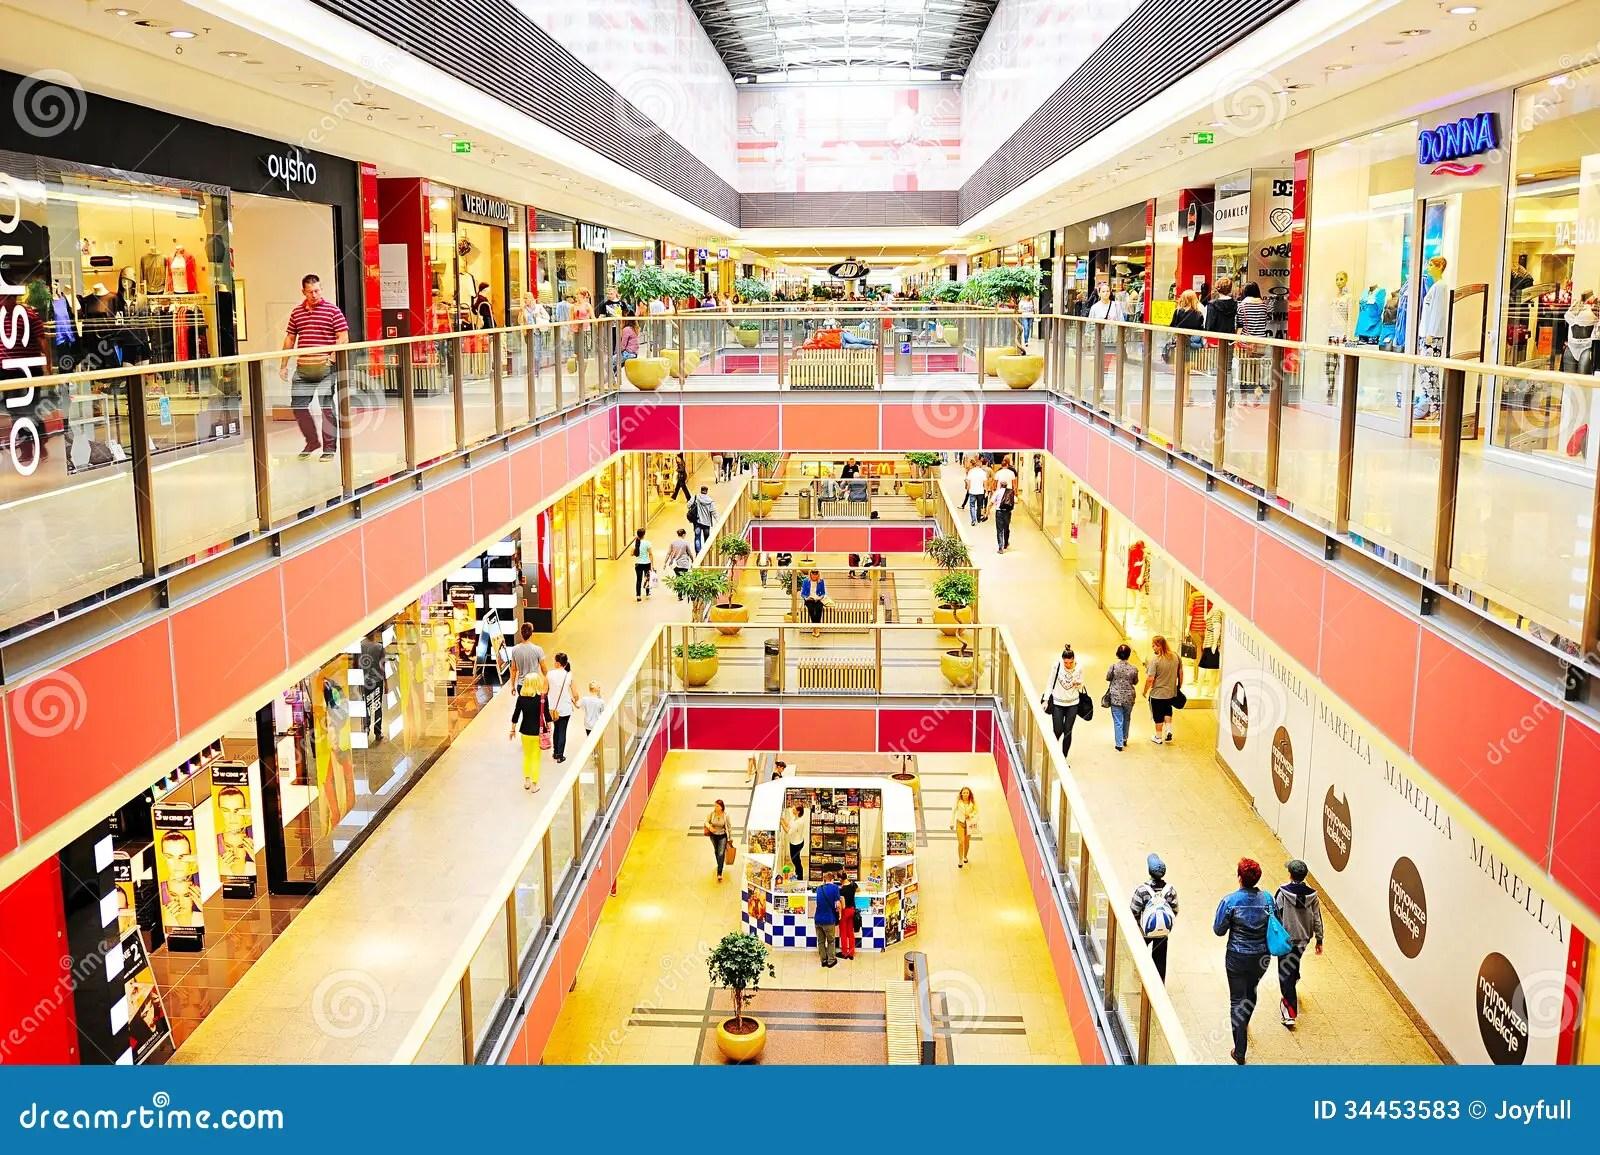 Free Retail Food Business Plans Bplans Galeria Krakowska Editorial Stock Photo Image 34453583